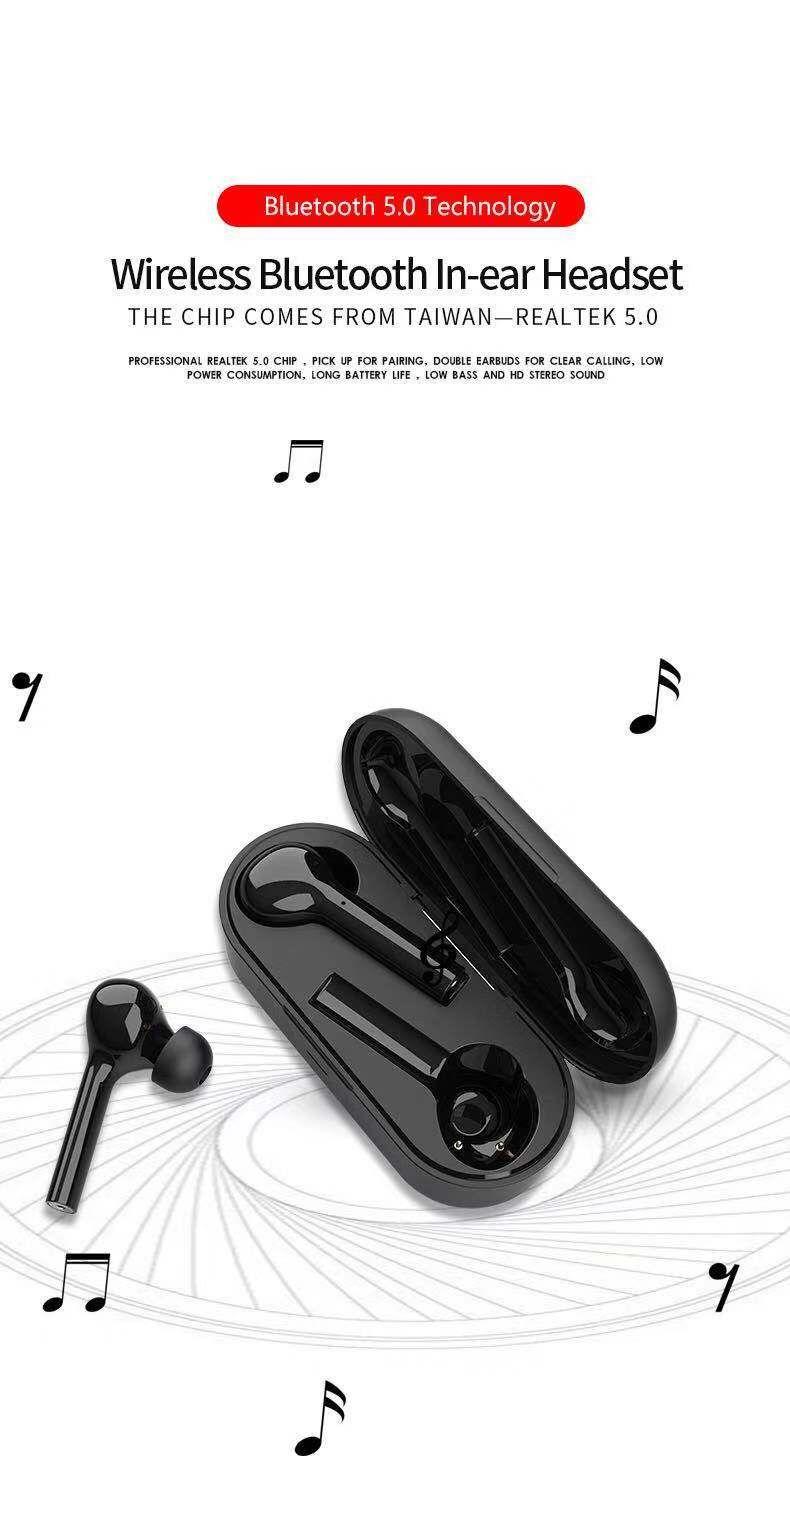 cf1e4719fdc JS-18 Wireless Bluetooth V5.0 Freebud TWS HIFI Earphone Bass With Charging  Box